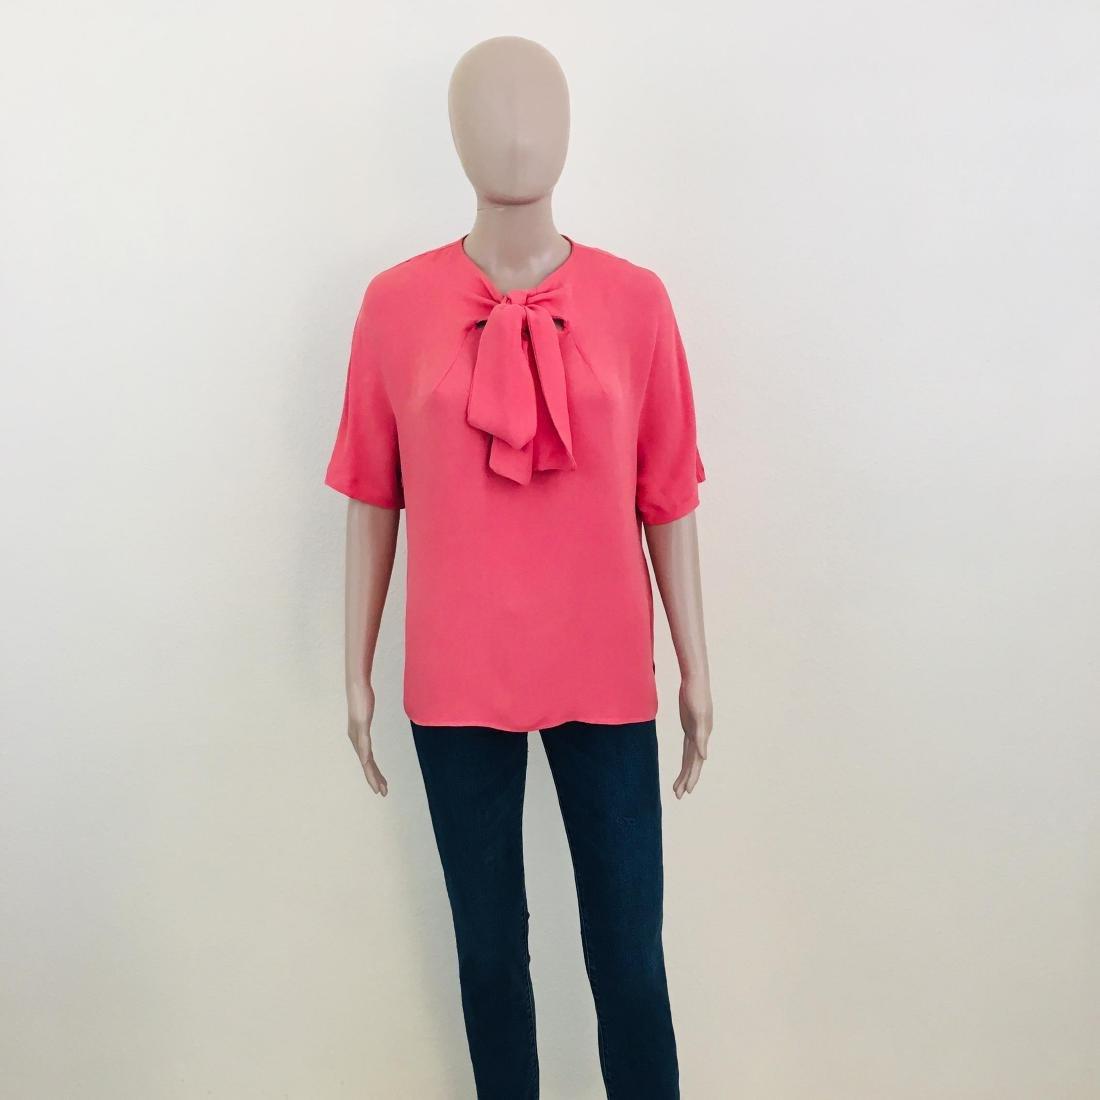 New Women's ZARA Top Blouse Size M - 2